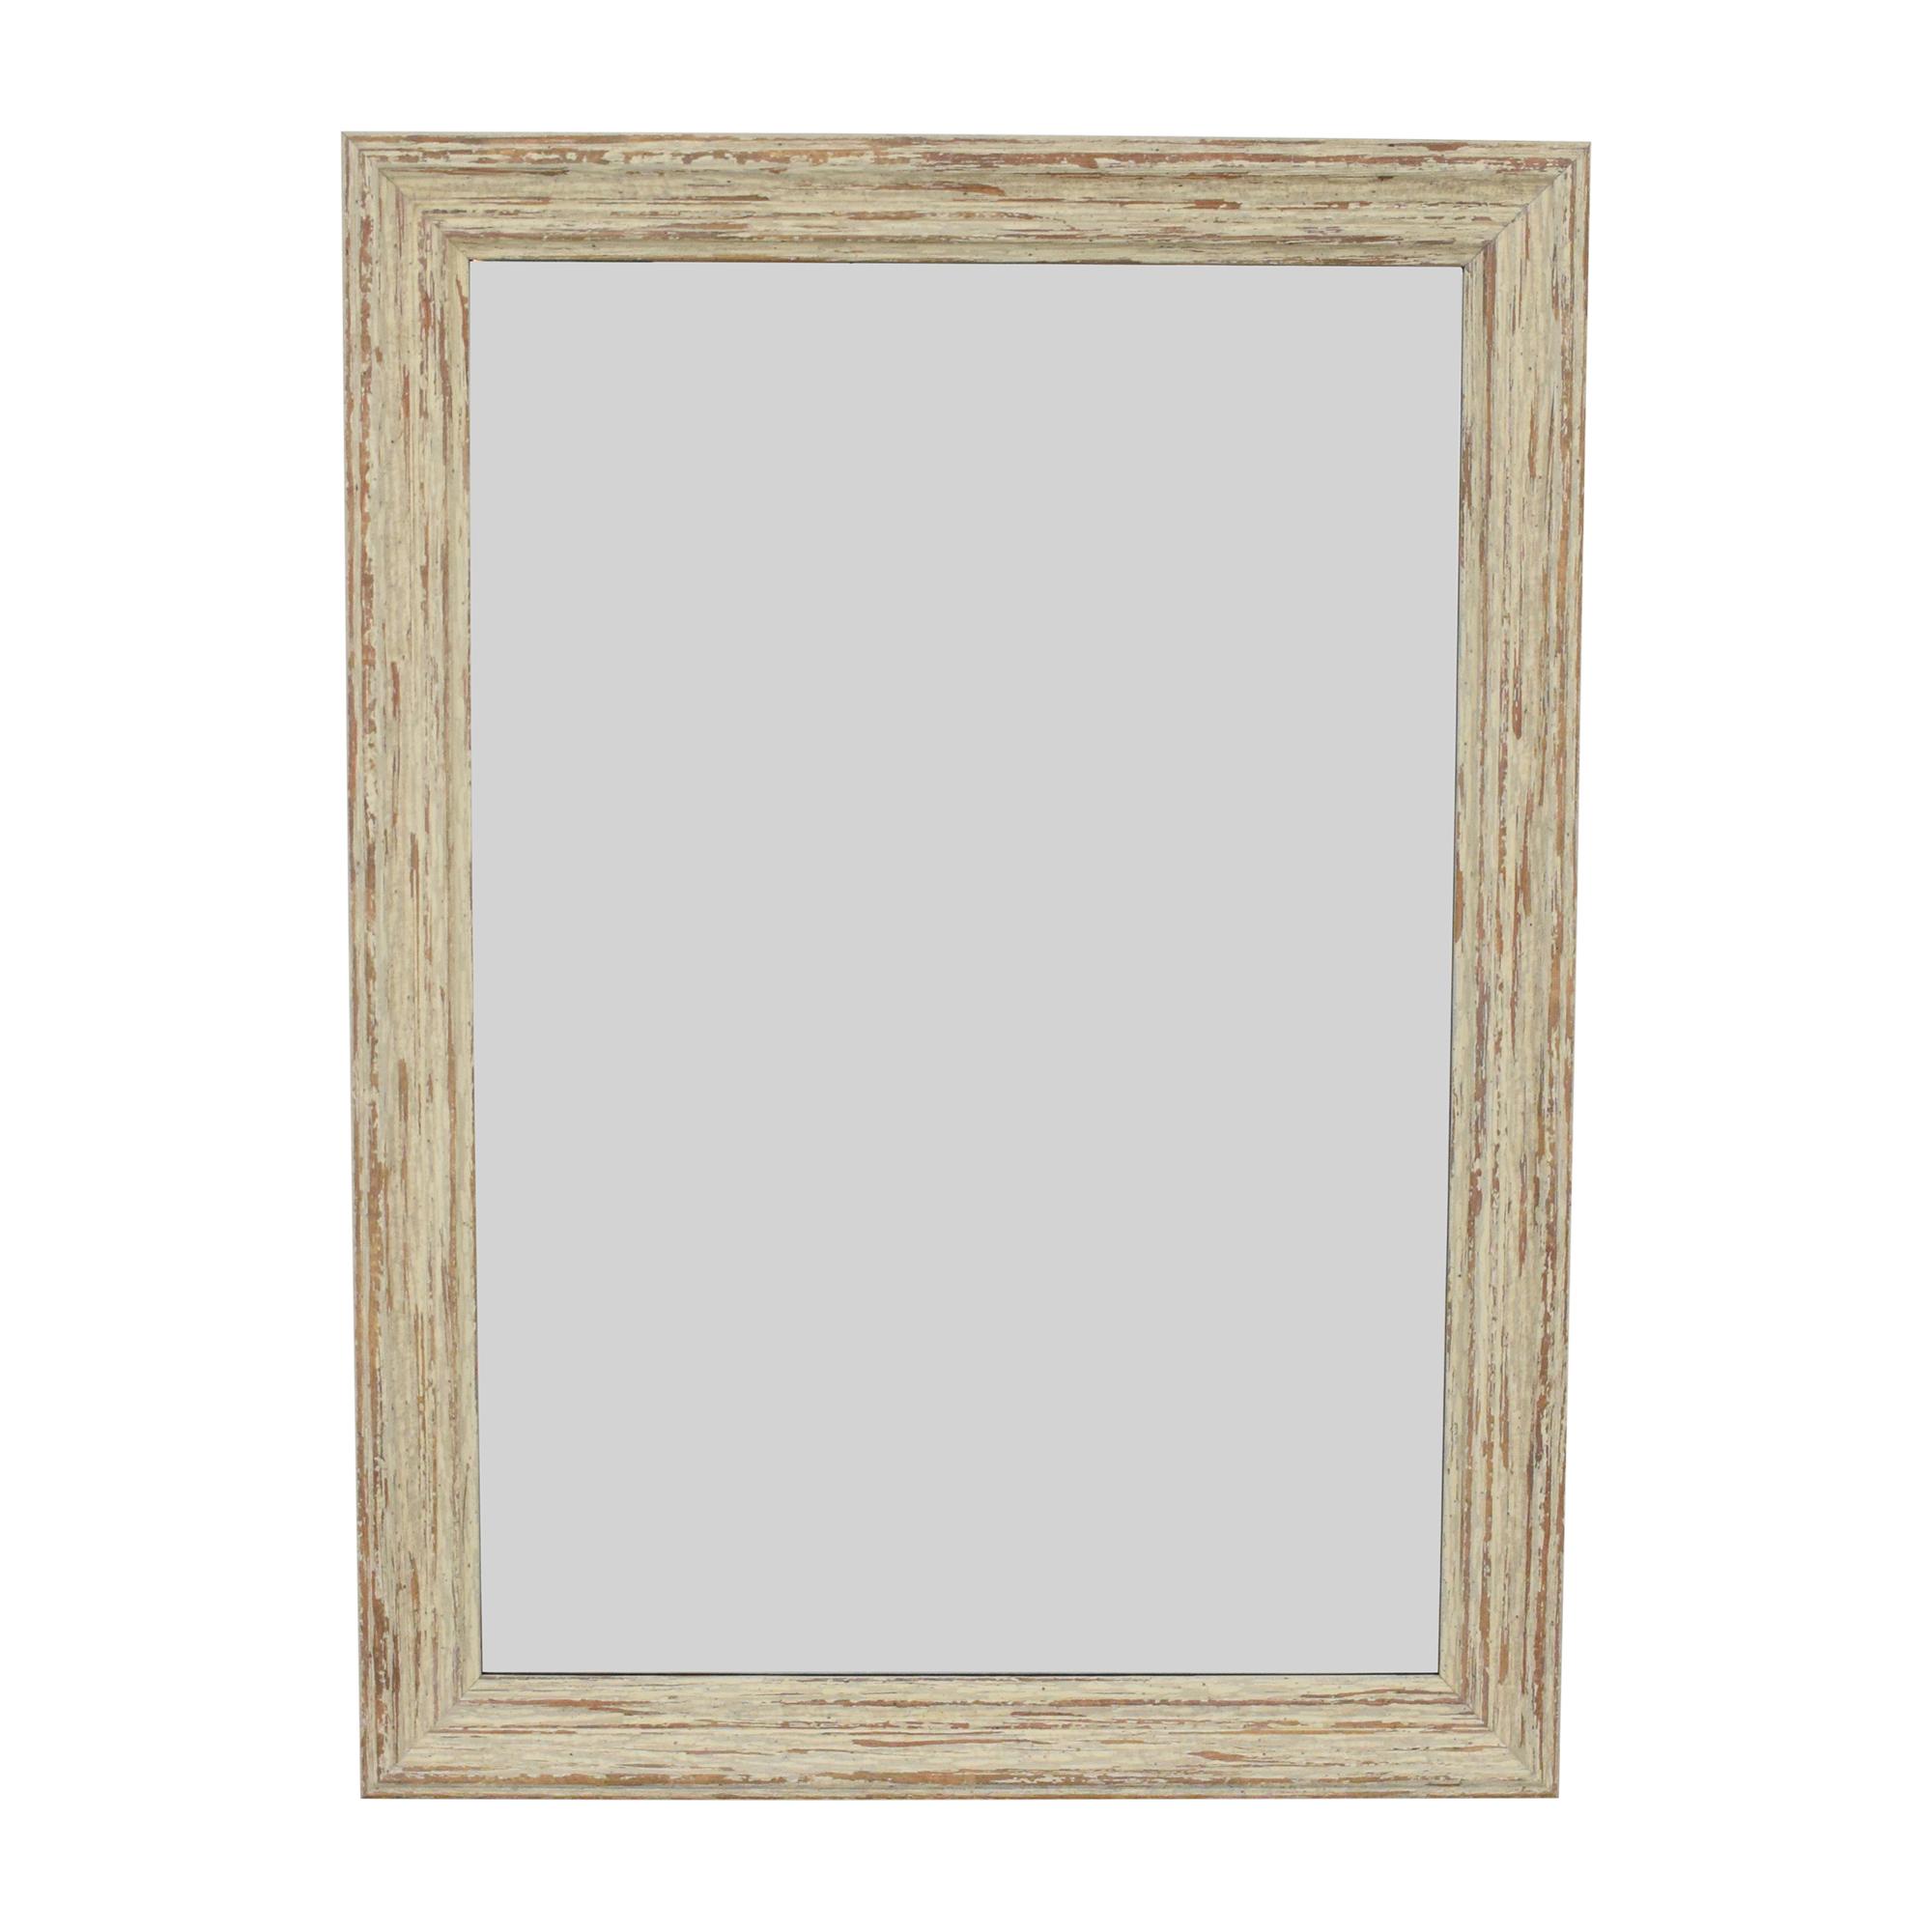 shop Shabby Chic Style Wall Mirror  Decor